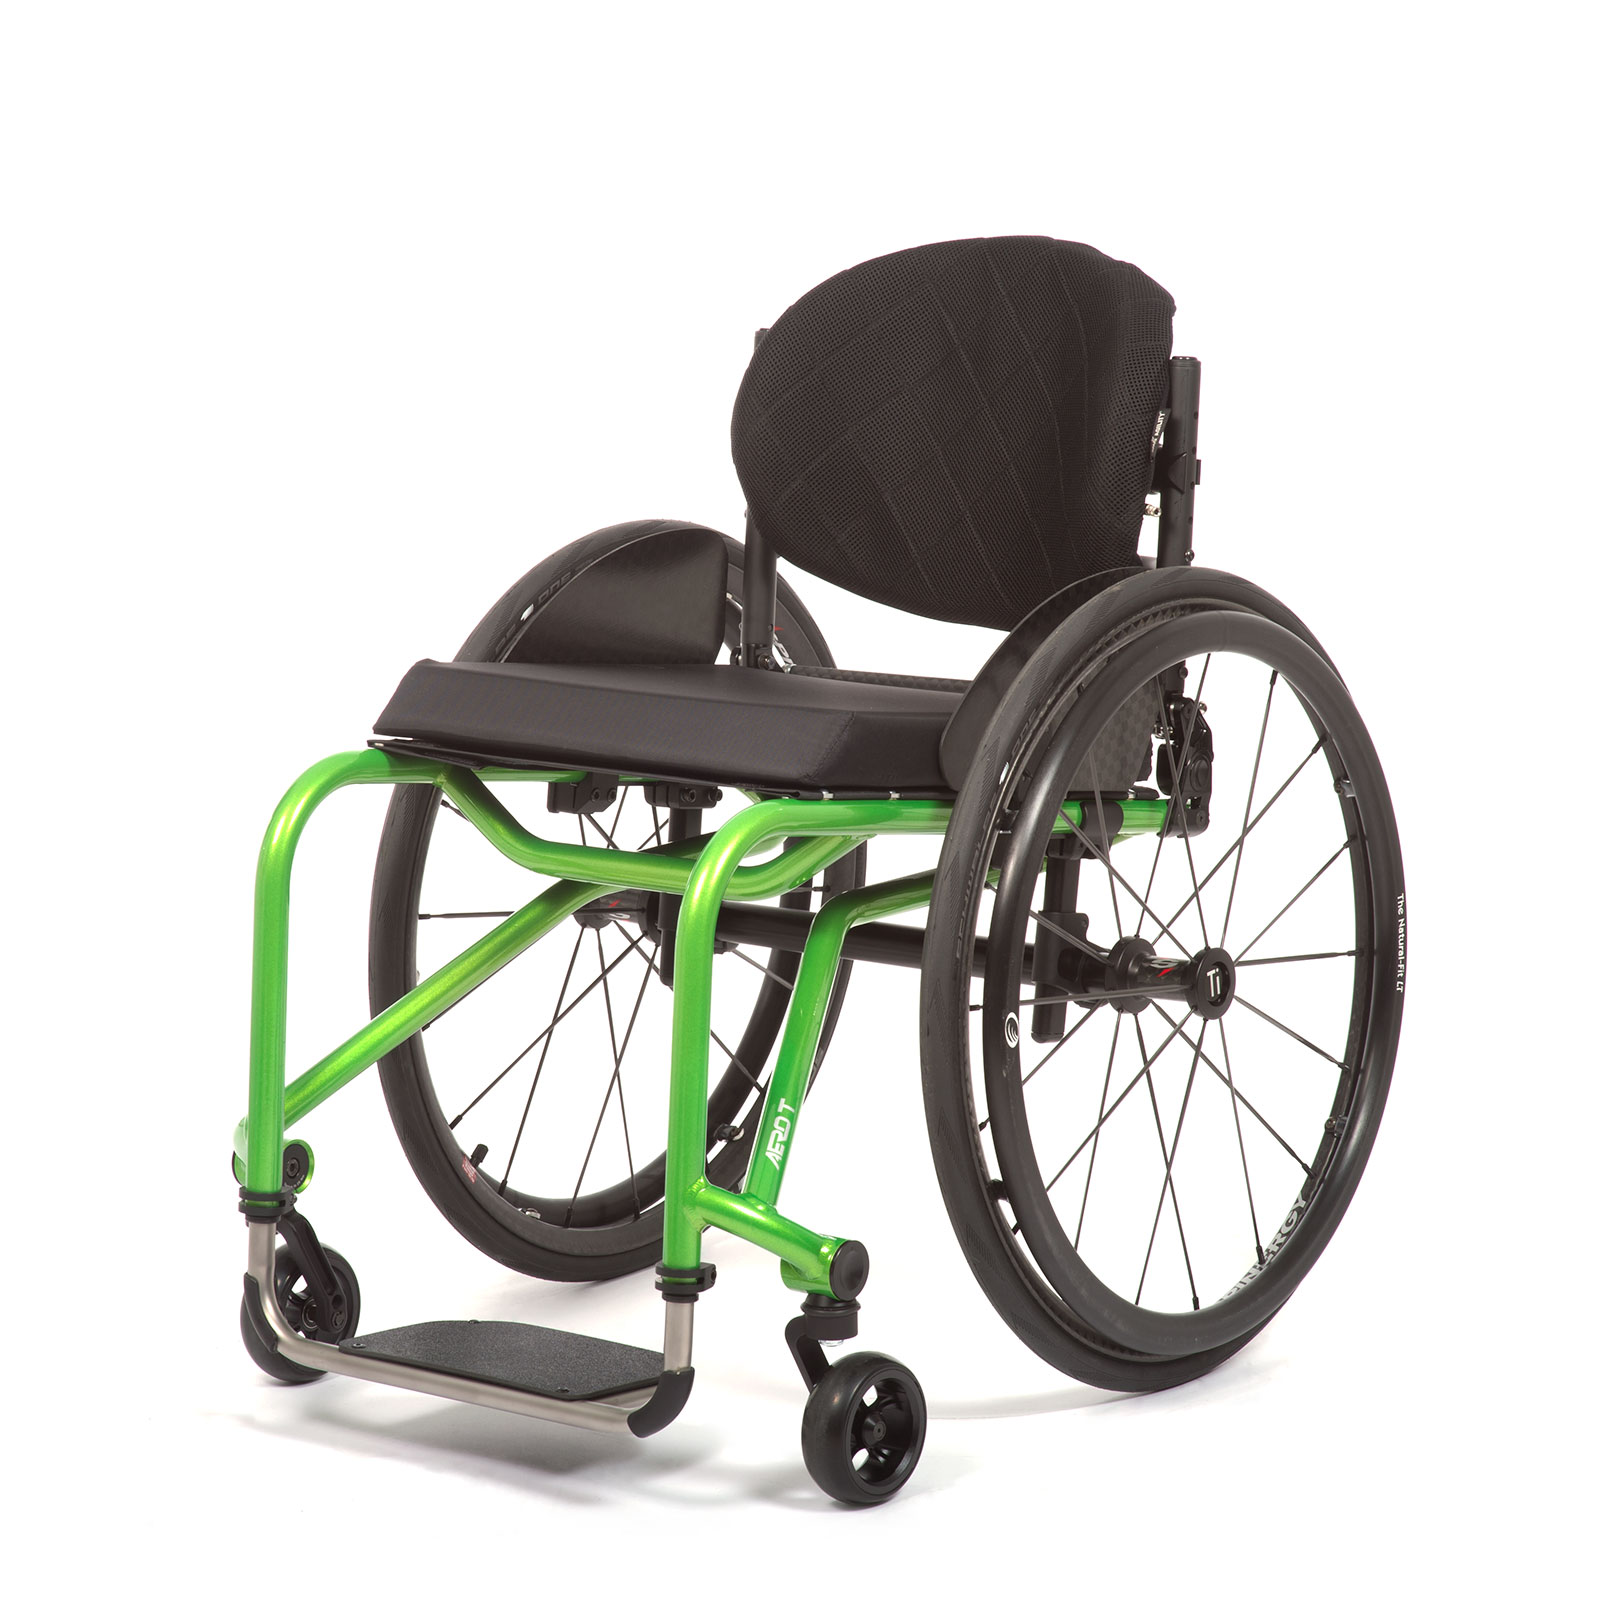 Aero T active wheelchair